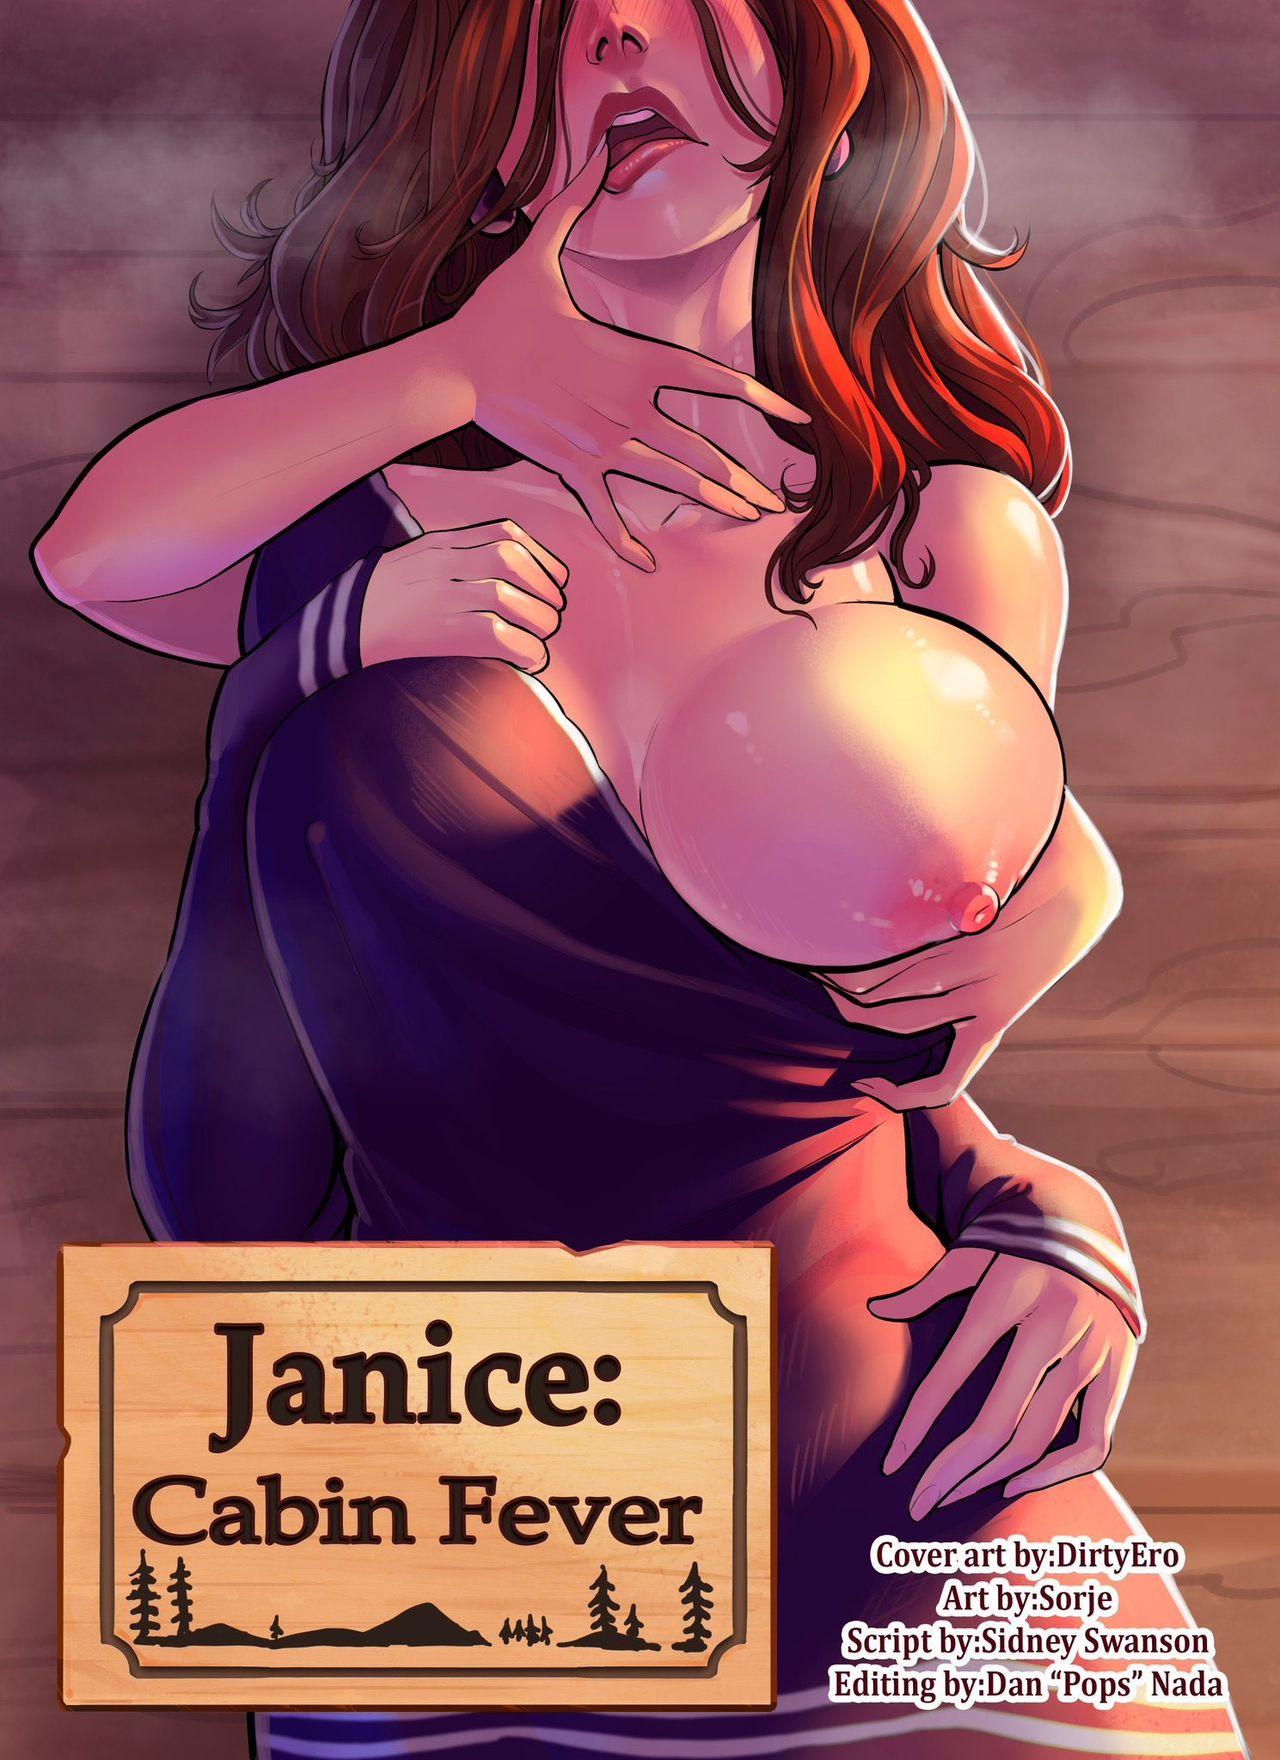 Janice: Cabana Quente